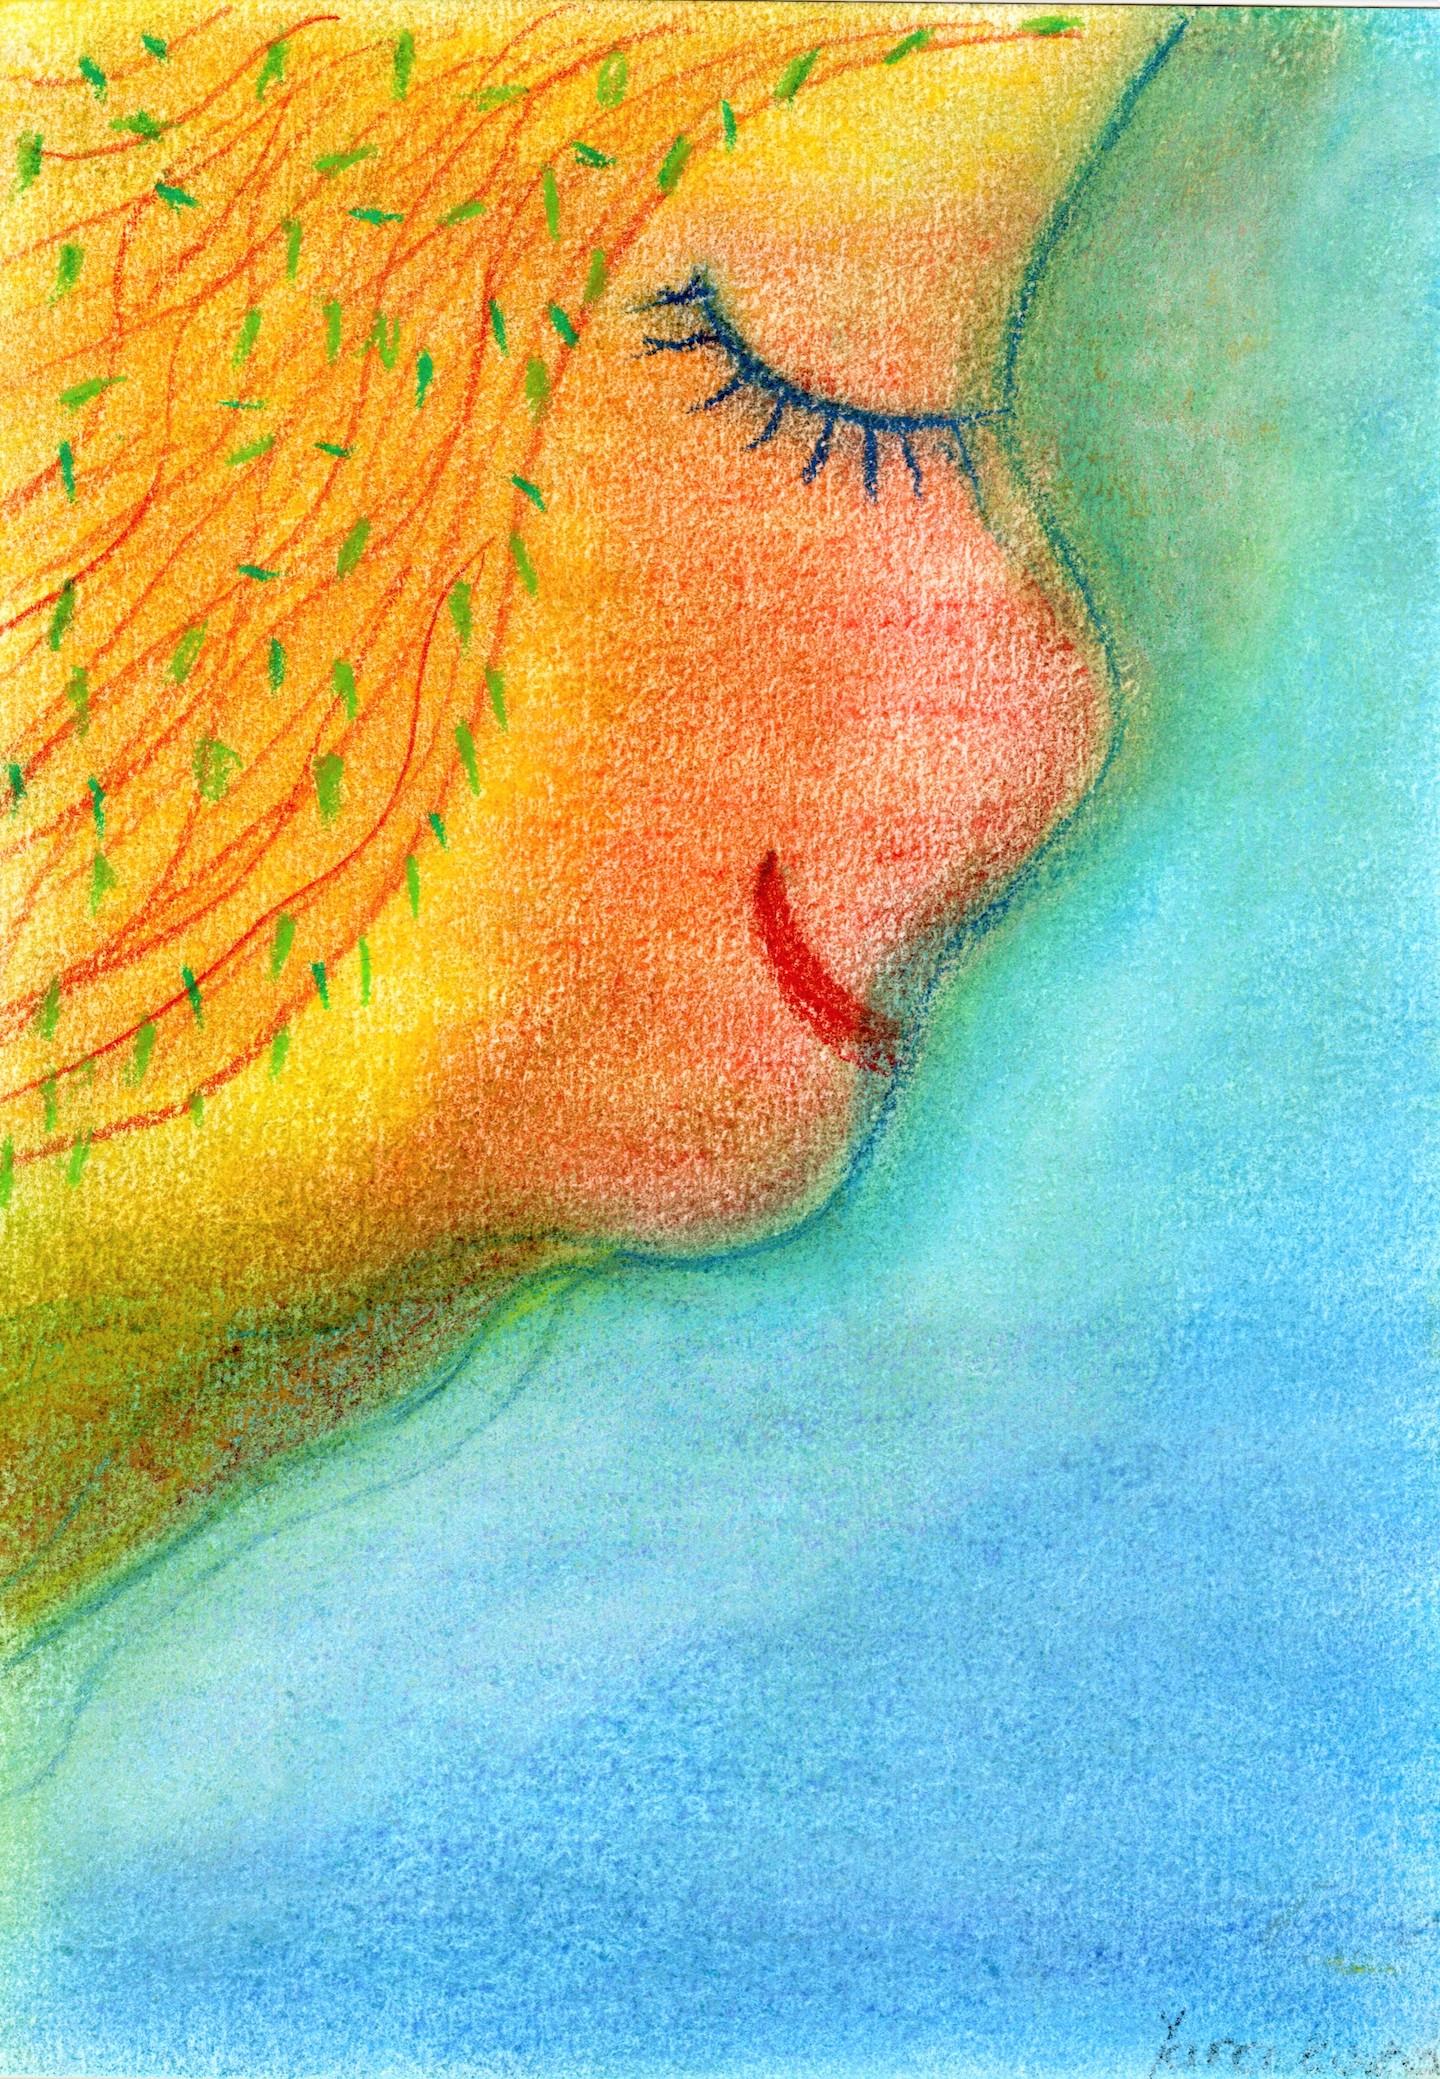 Soul Dreaming, by Laura Maria Yara